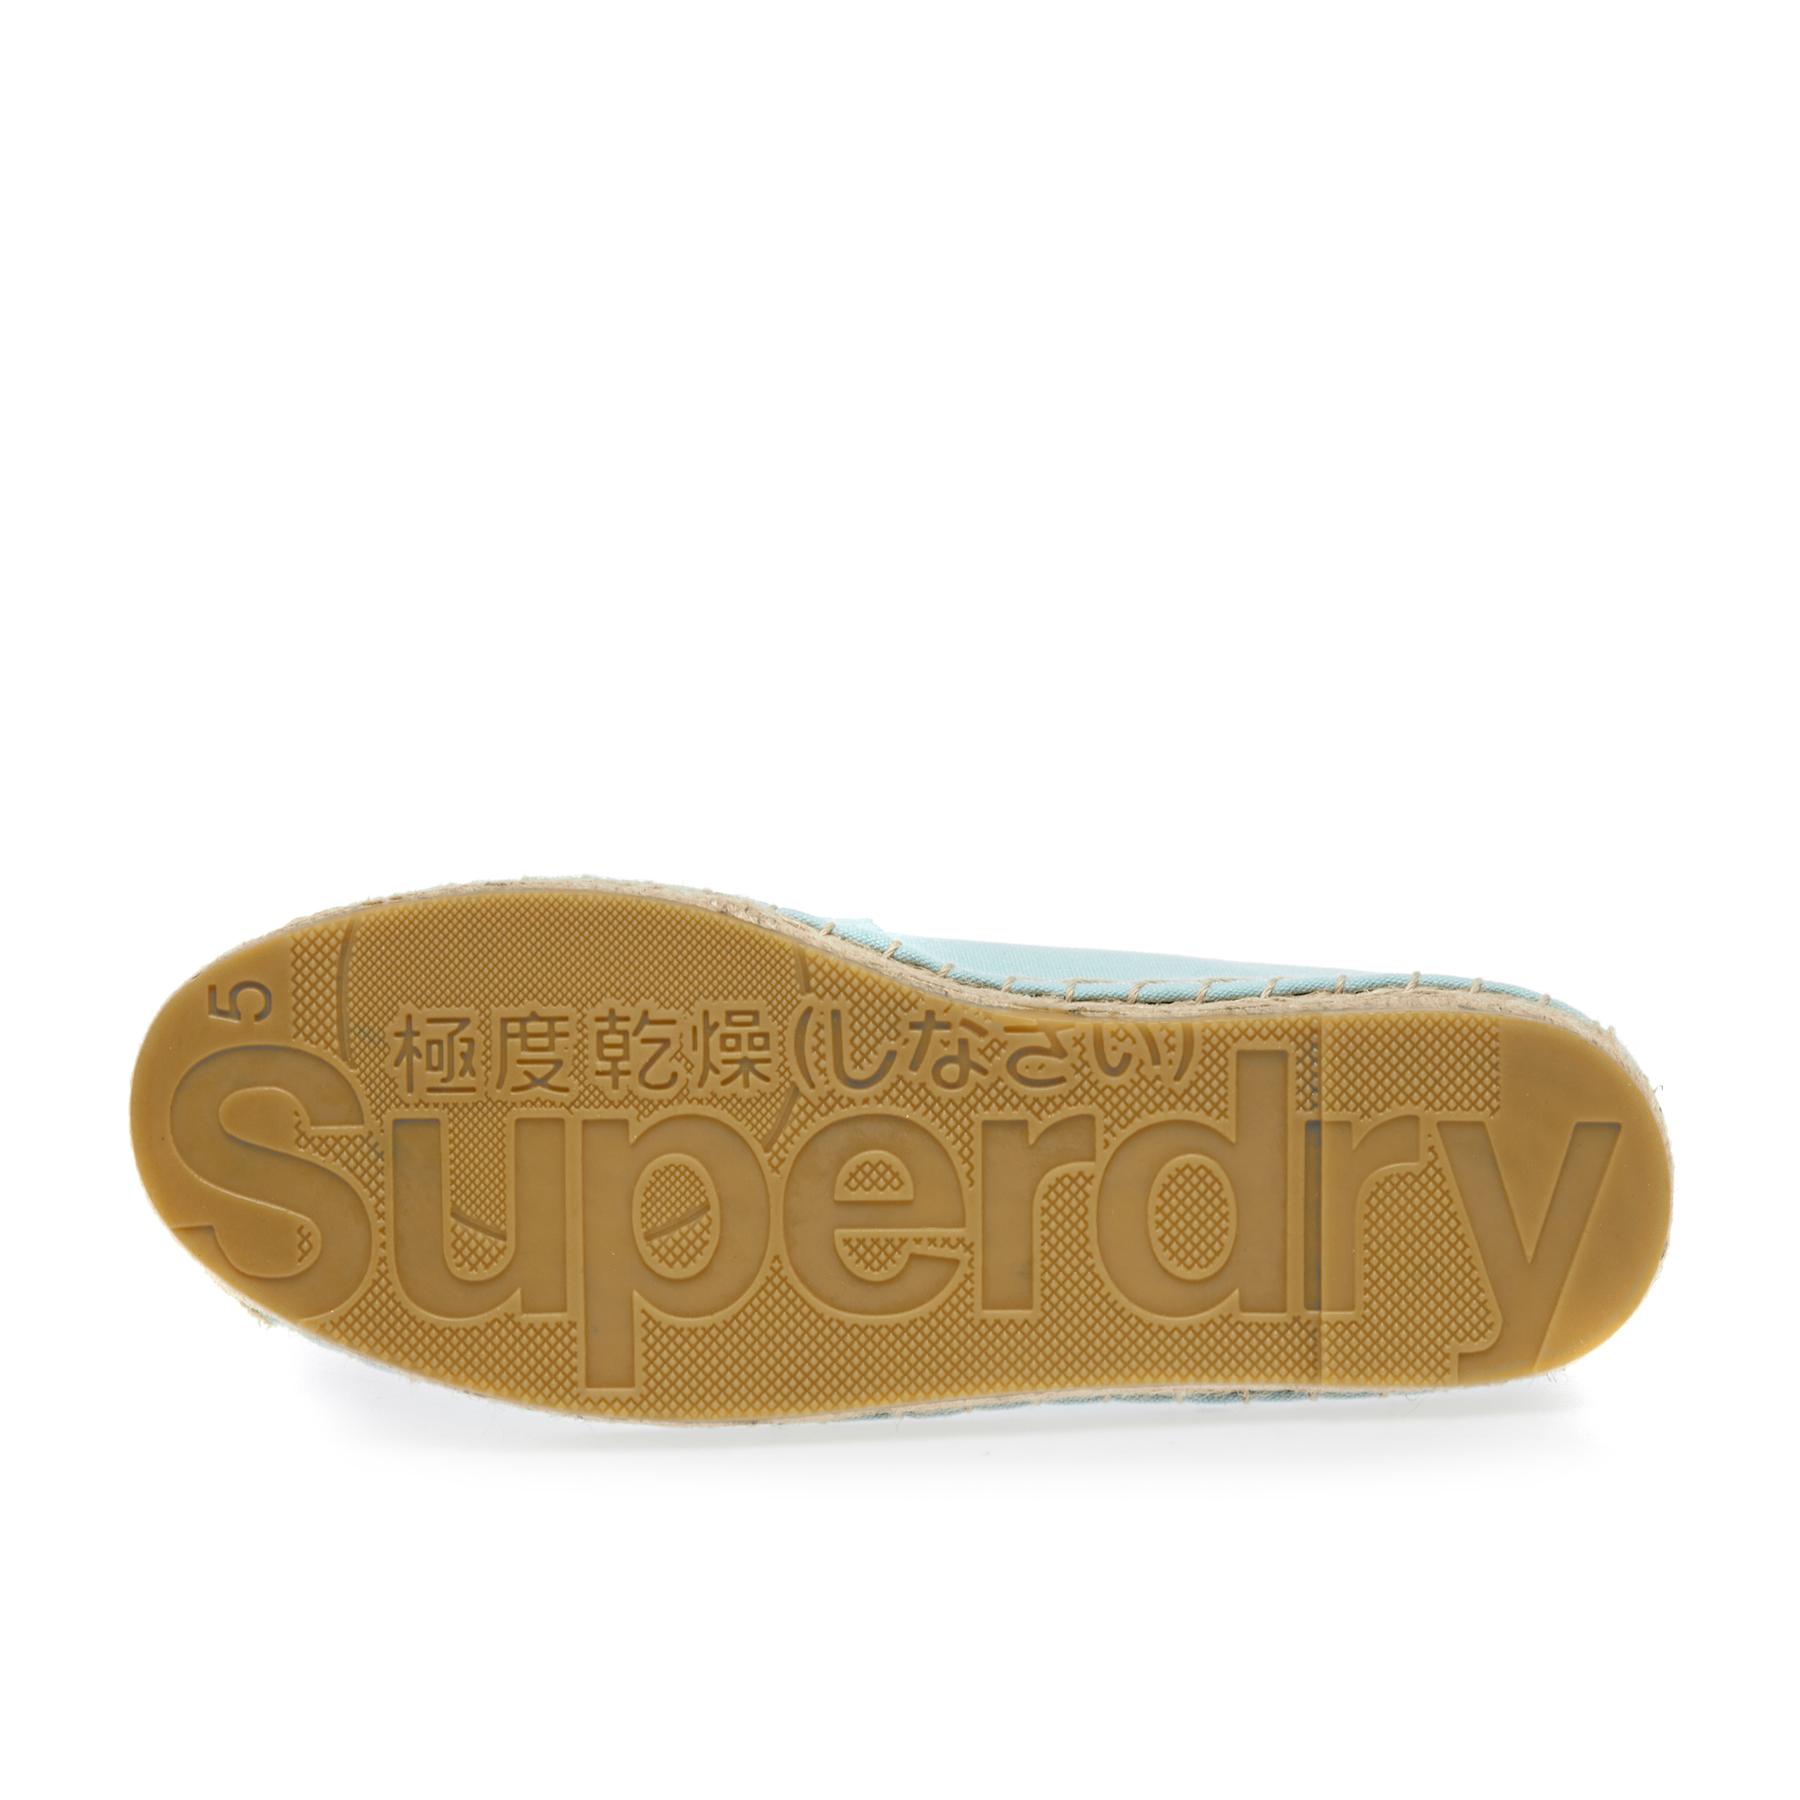 Superdry Erin Womens Footwear Espadrilles Soft Mint All Sizes